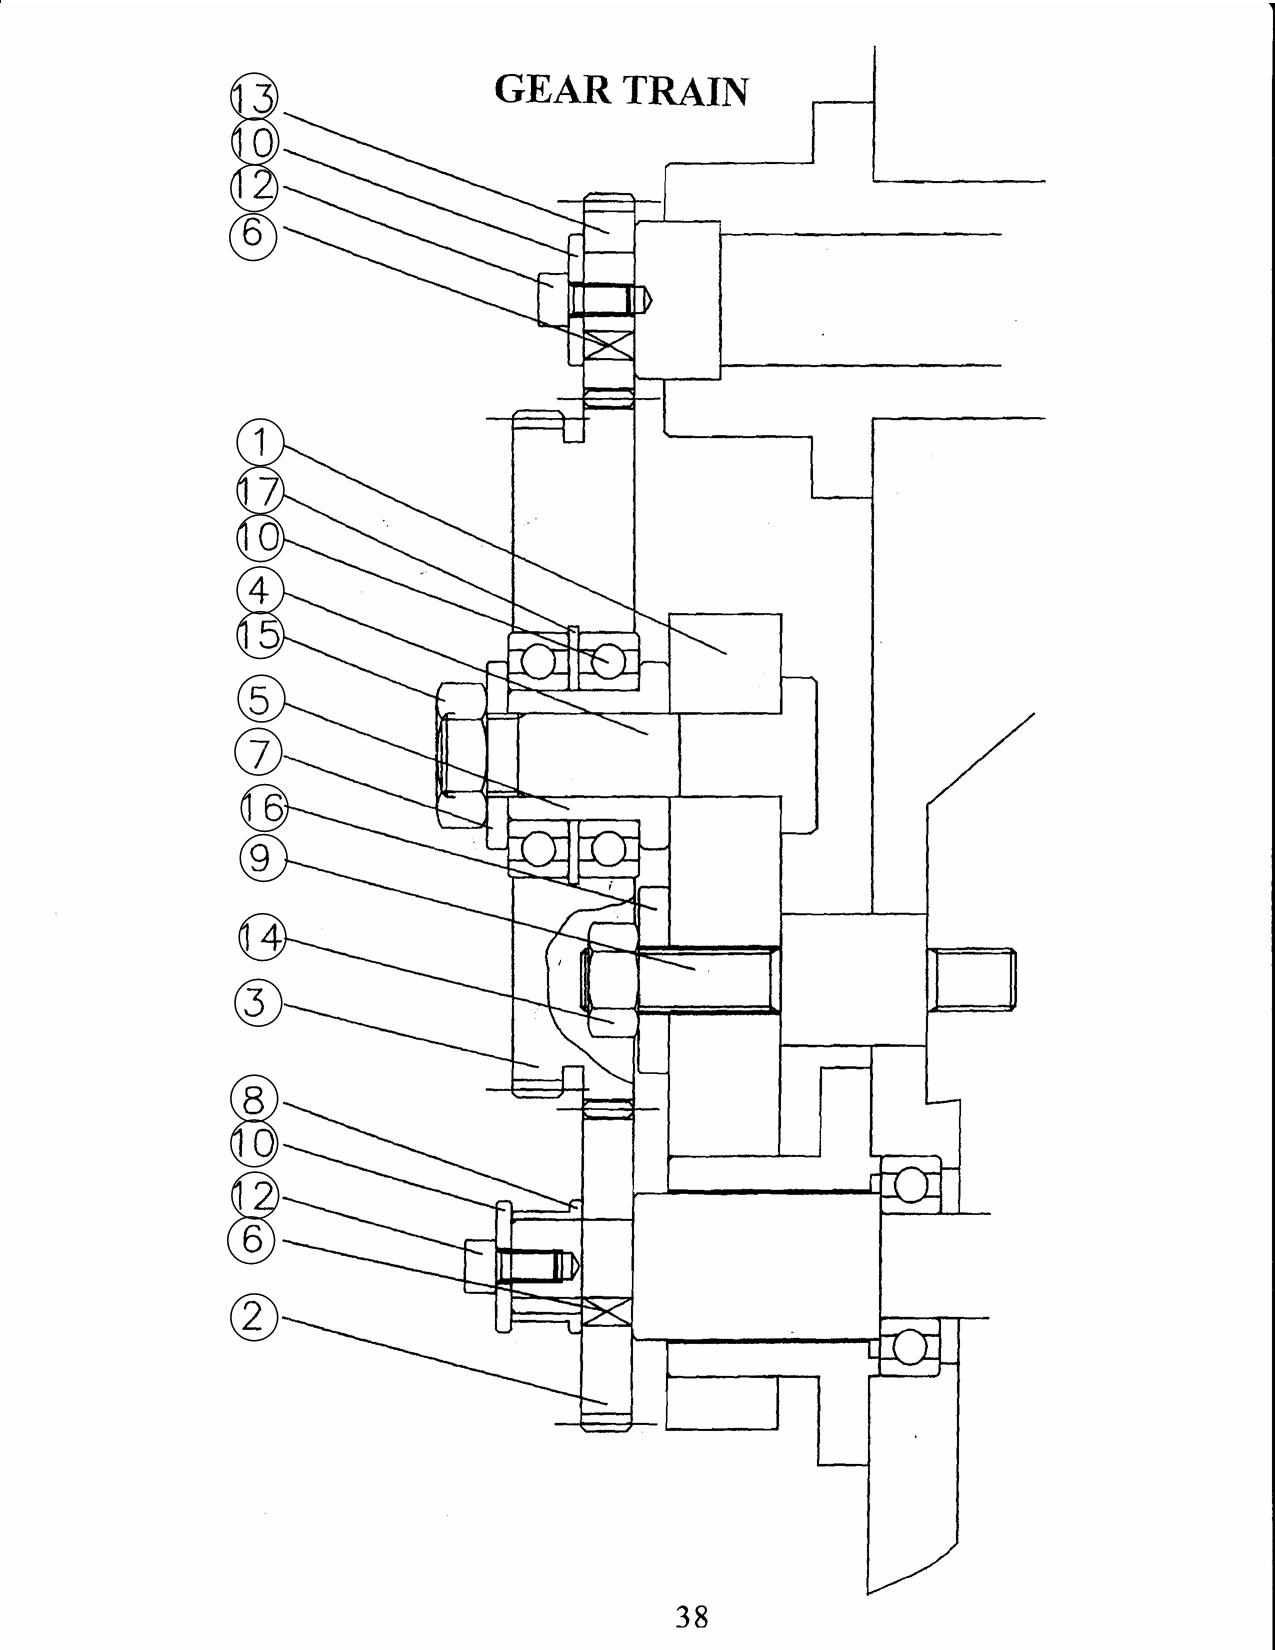 hight resolution of gear train diagram